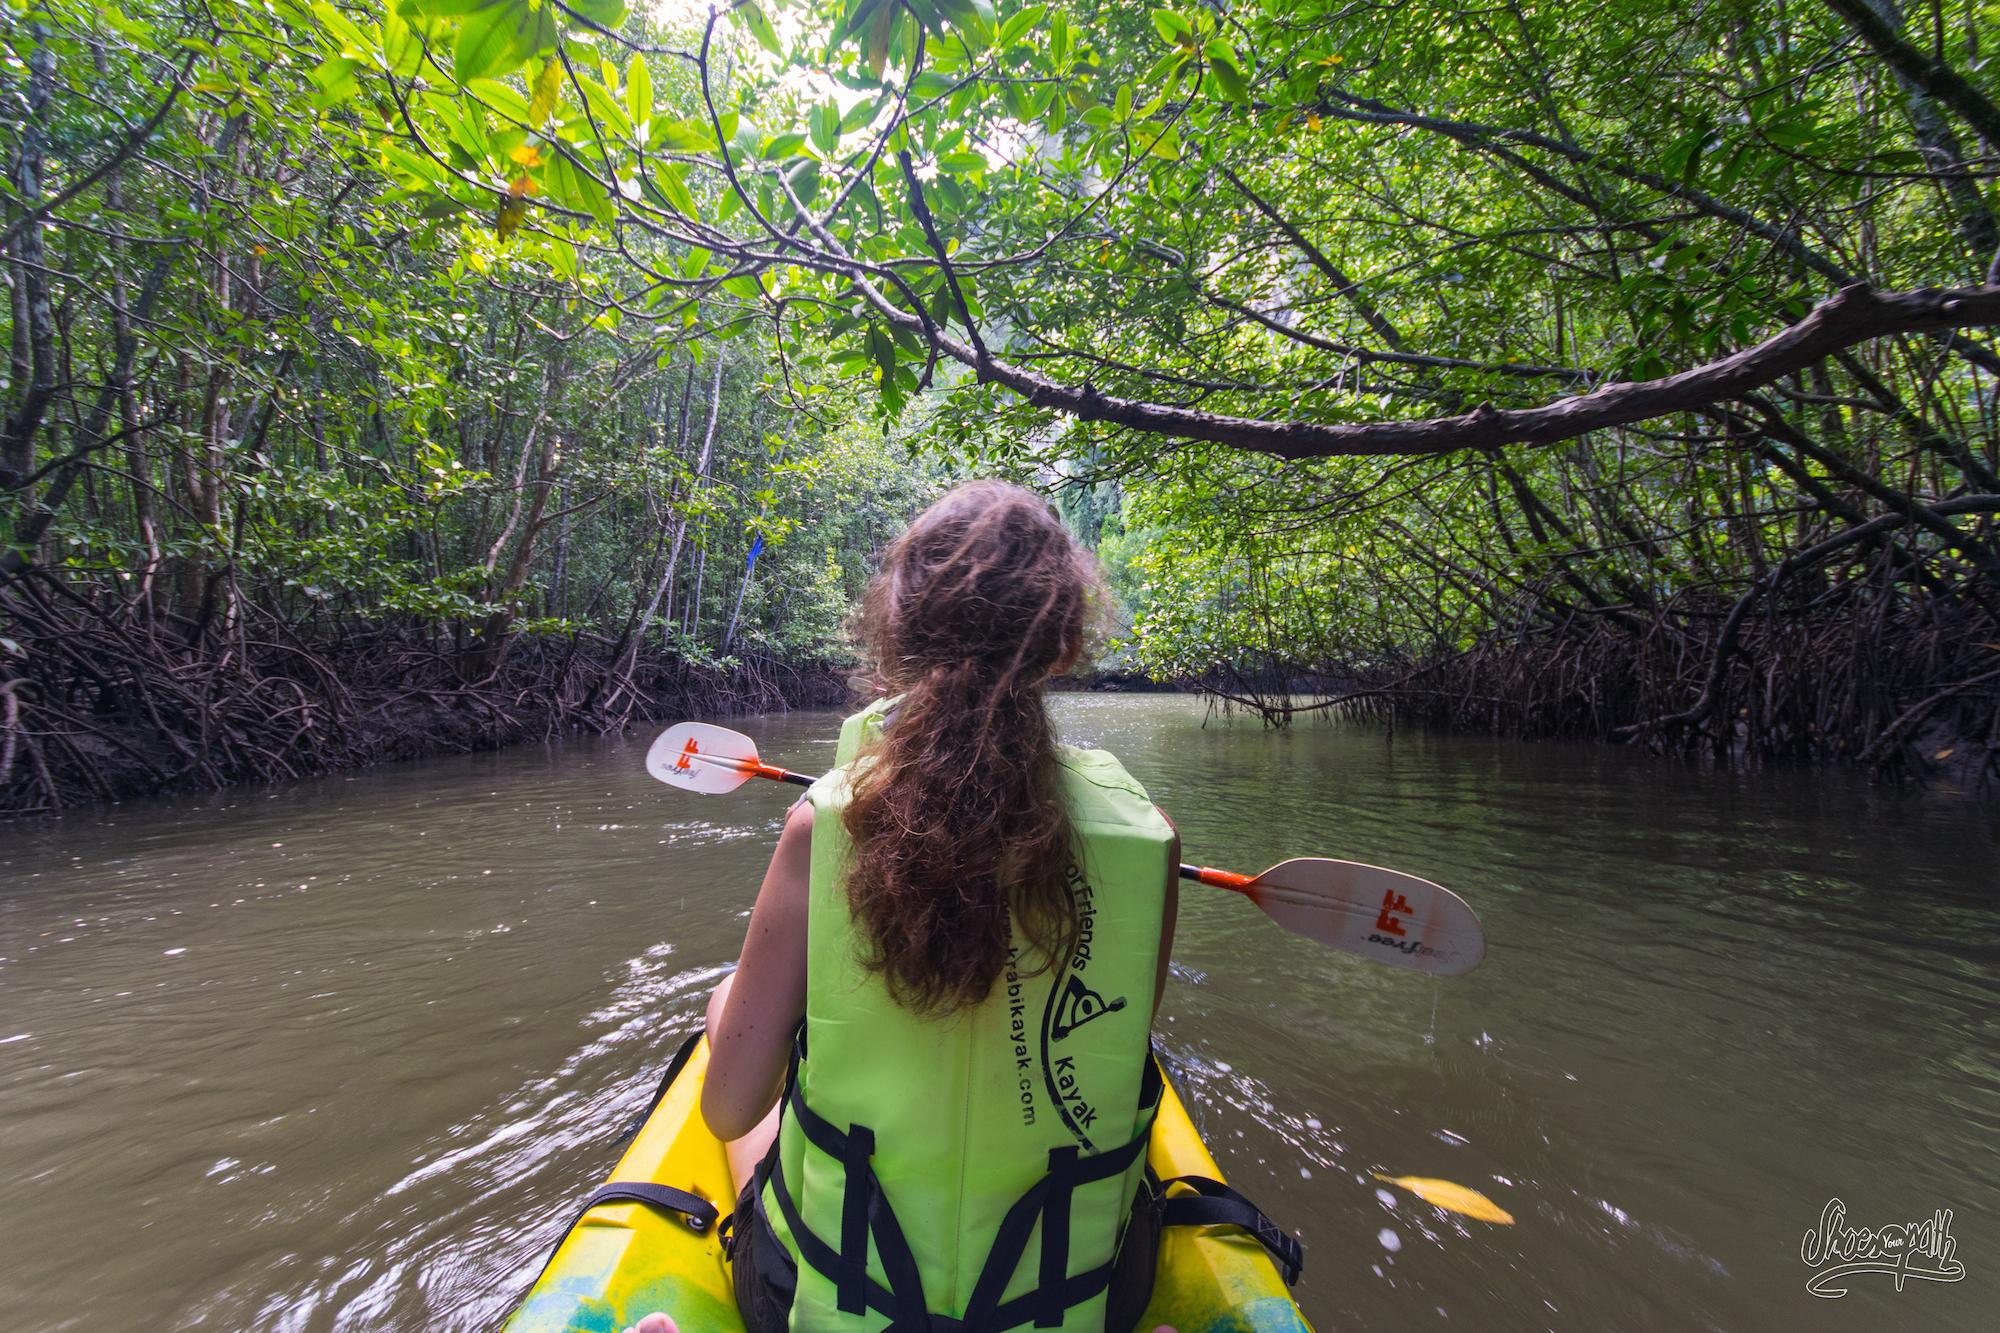 Kayak shoesyourpath